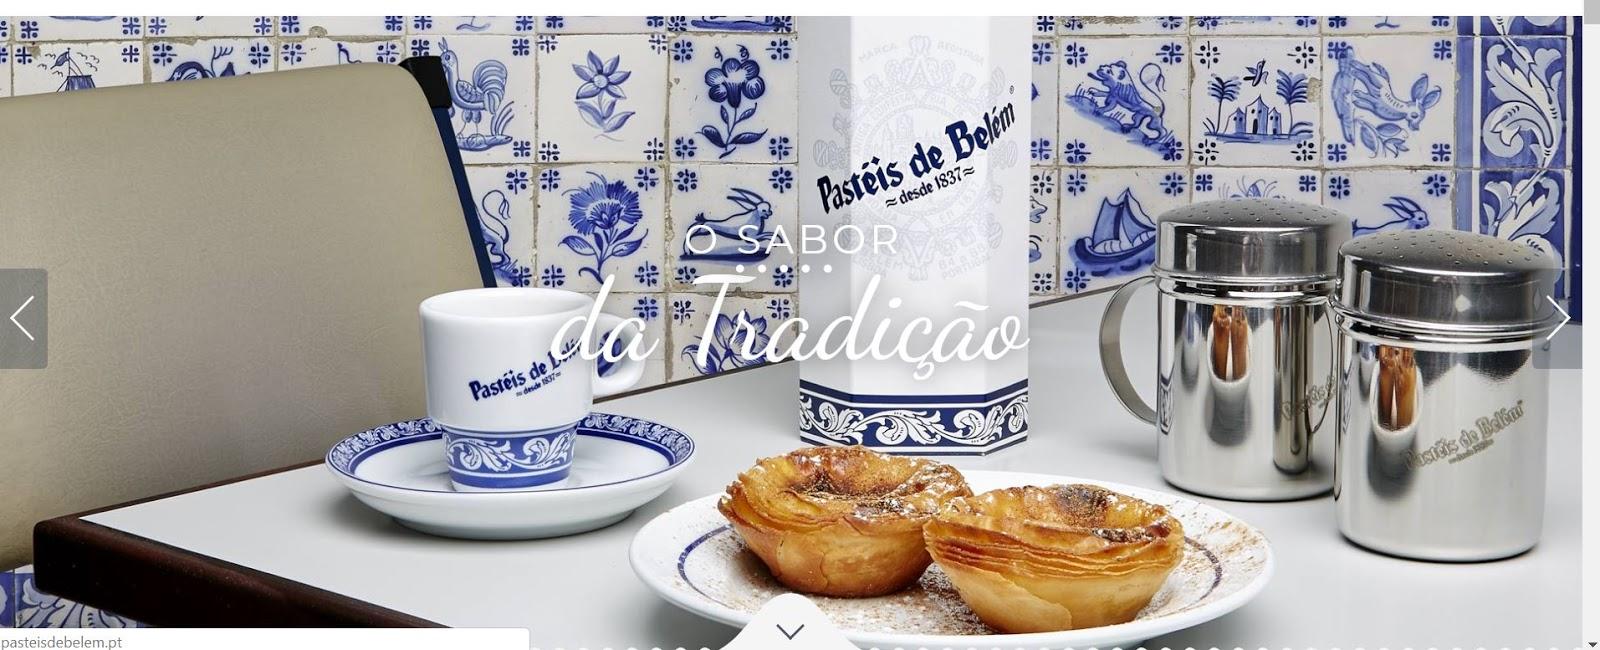 A historia do Pastel de Belém de Portugal